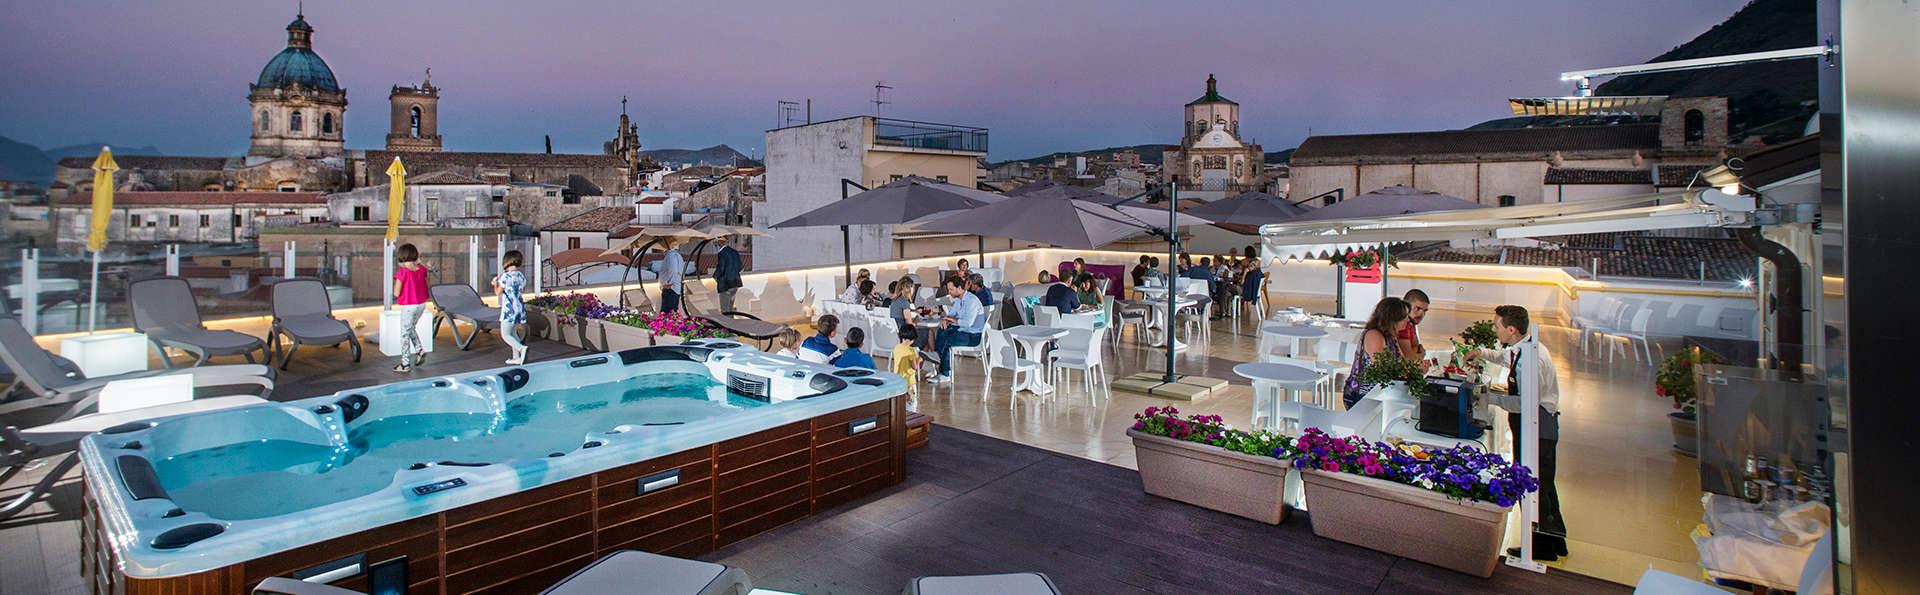 Hotel Centrale - Alcamo - EDIT_NEW_Terrace.jpg